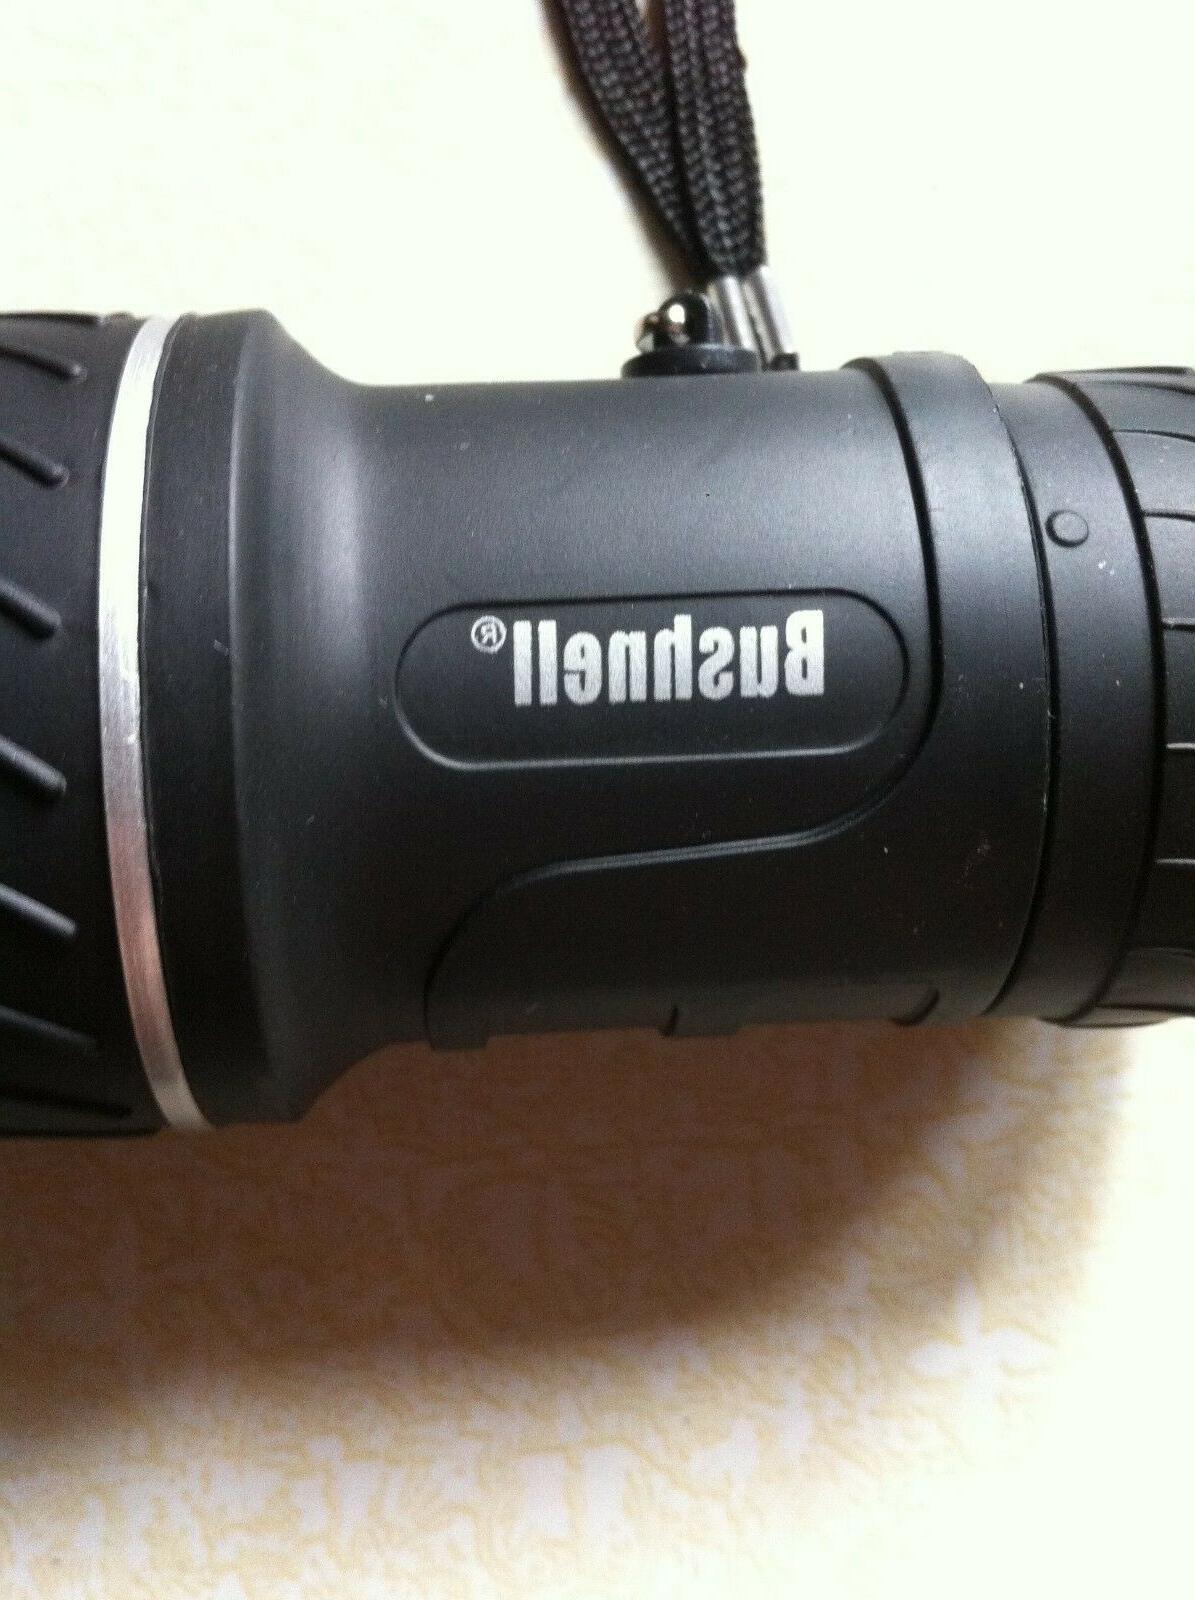 Bushnell Monocular 16x52 zoom lens day/dusk vision free